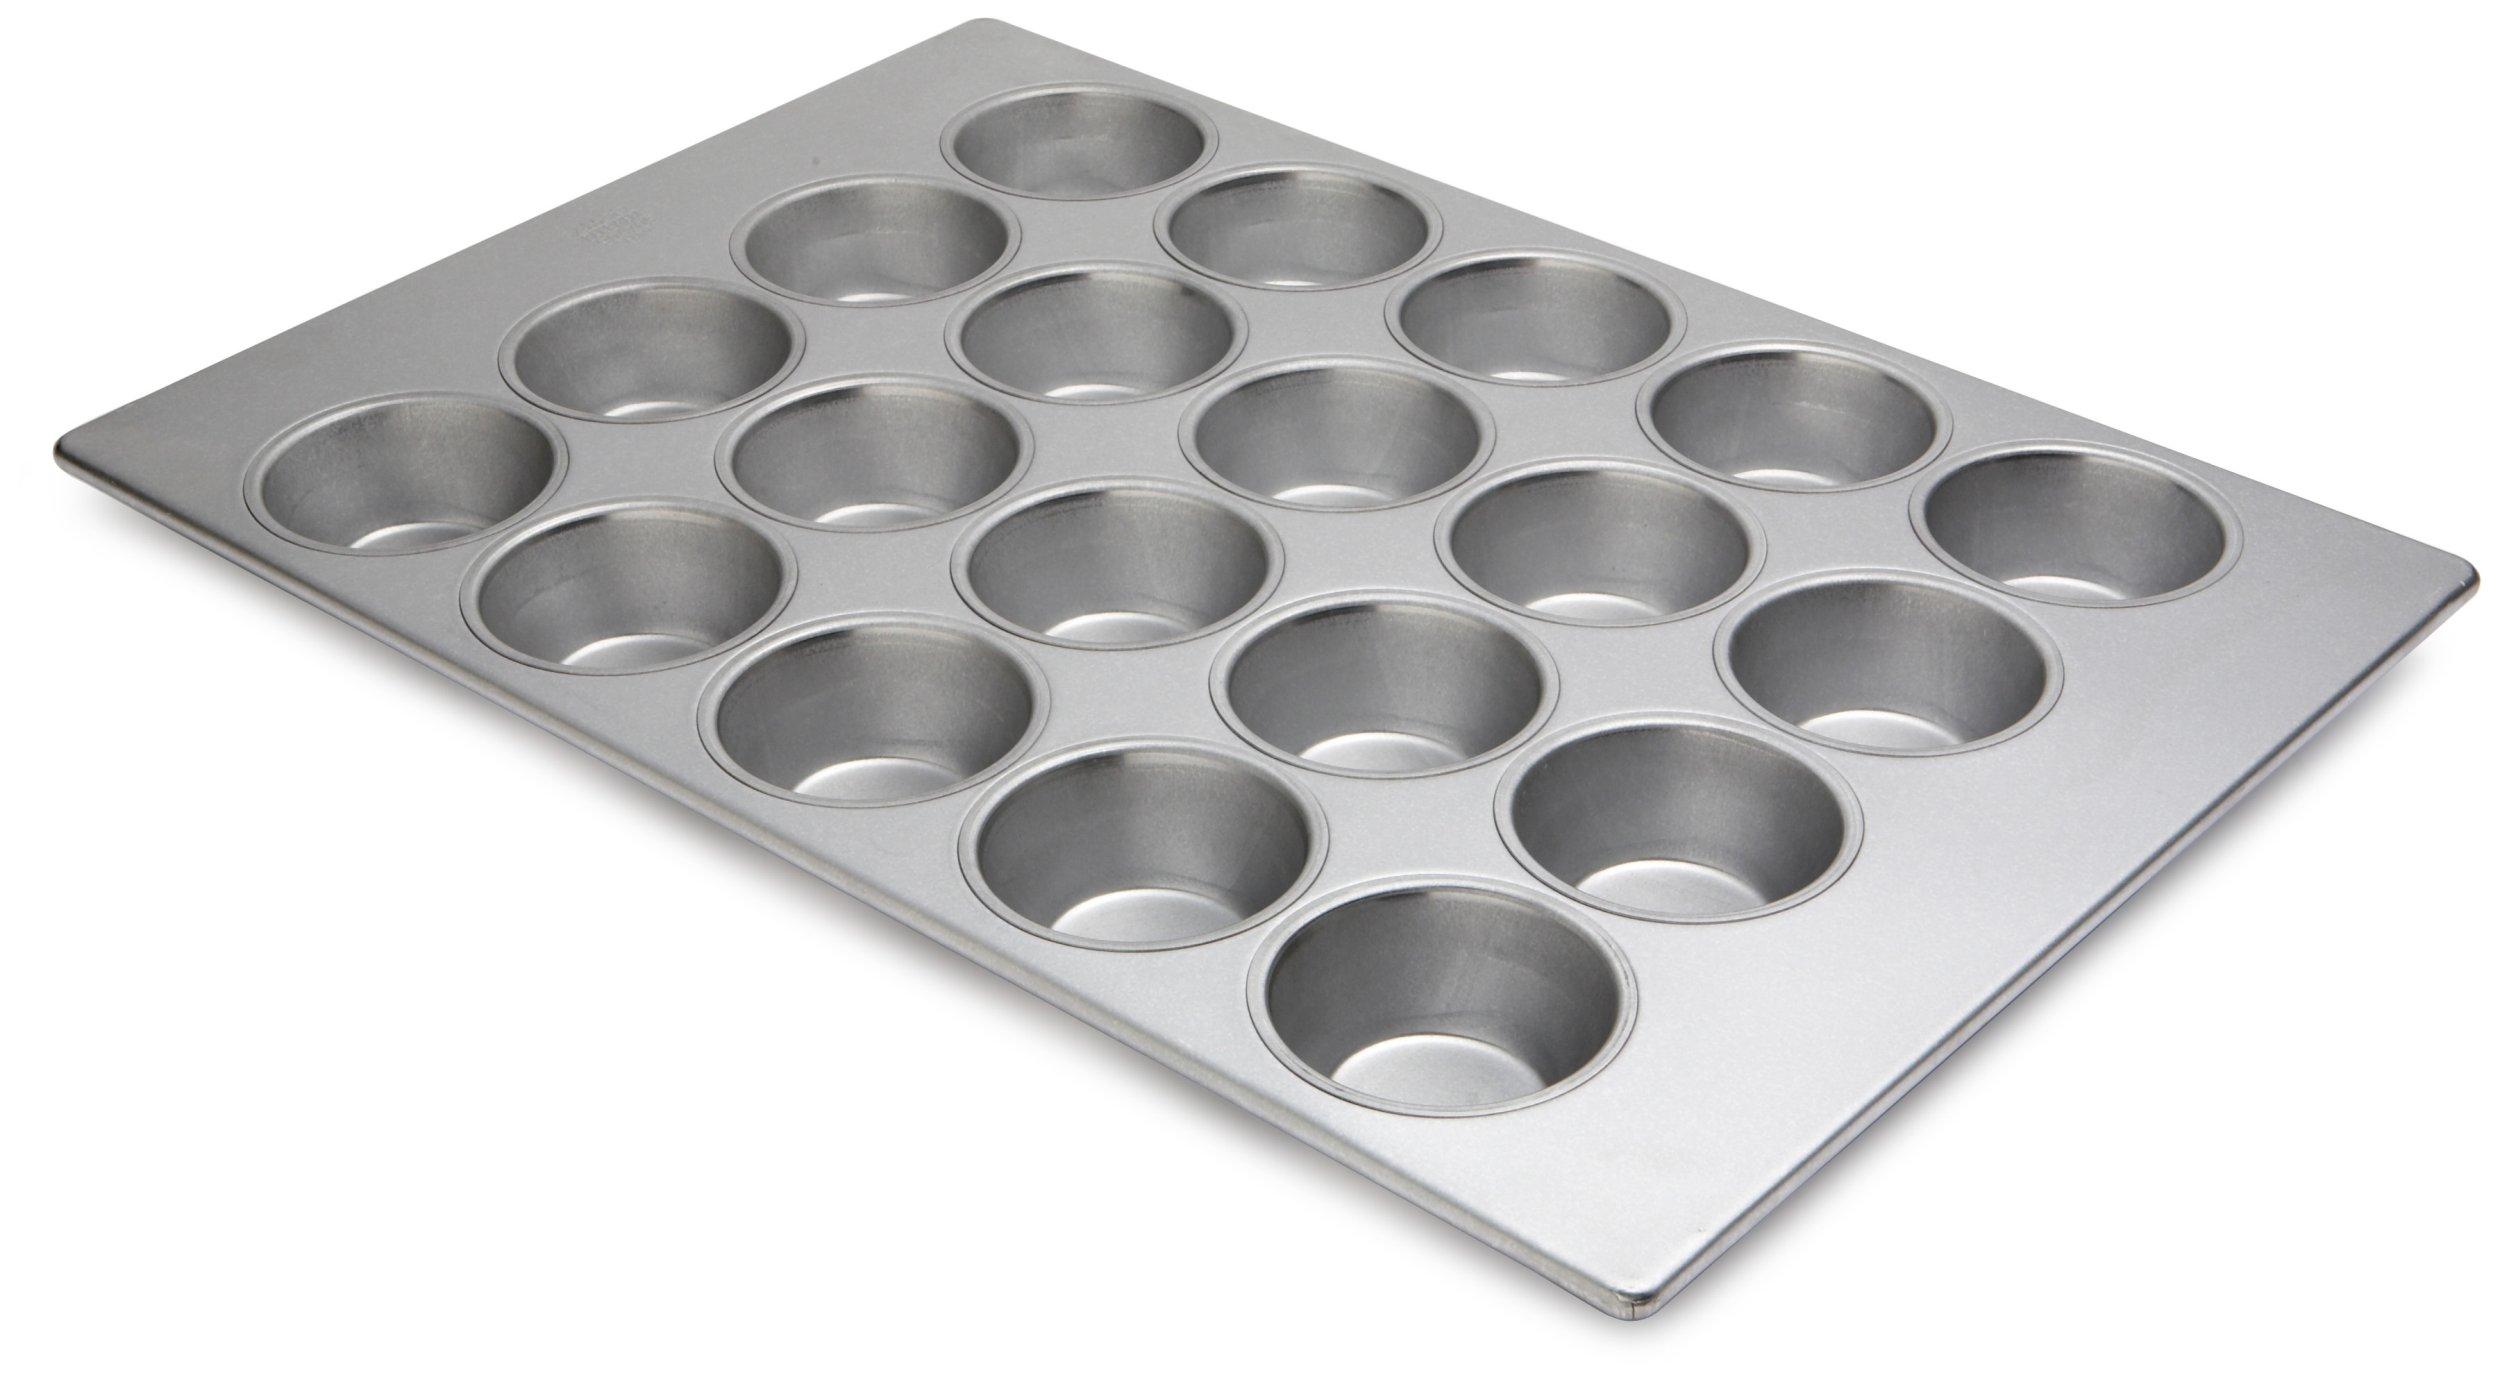 Focus Foodservice Commercial Bakeware Pecan Roll Pan, 20 Cup